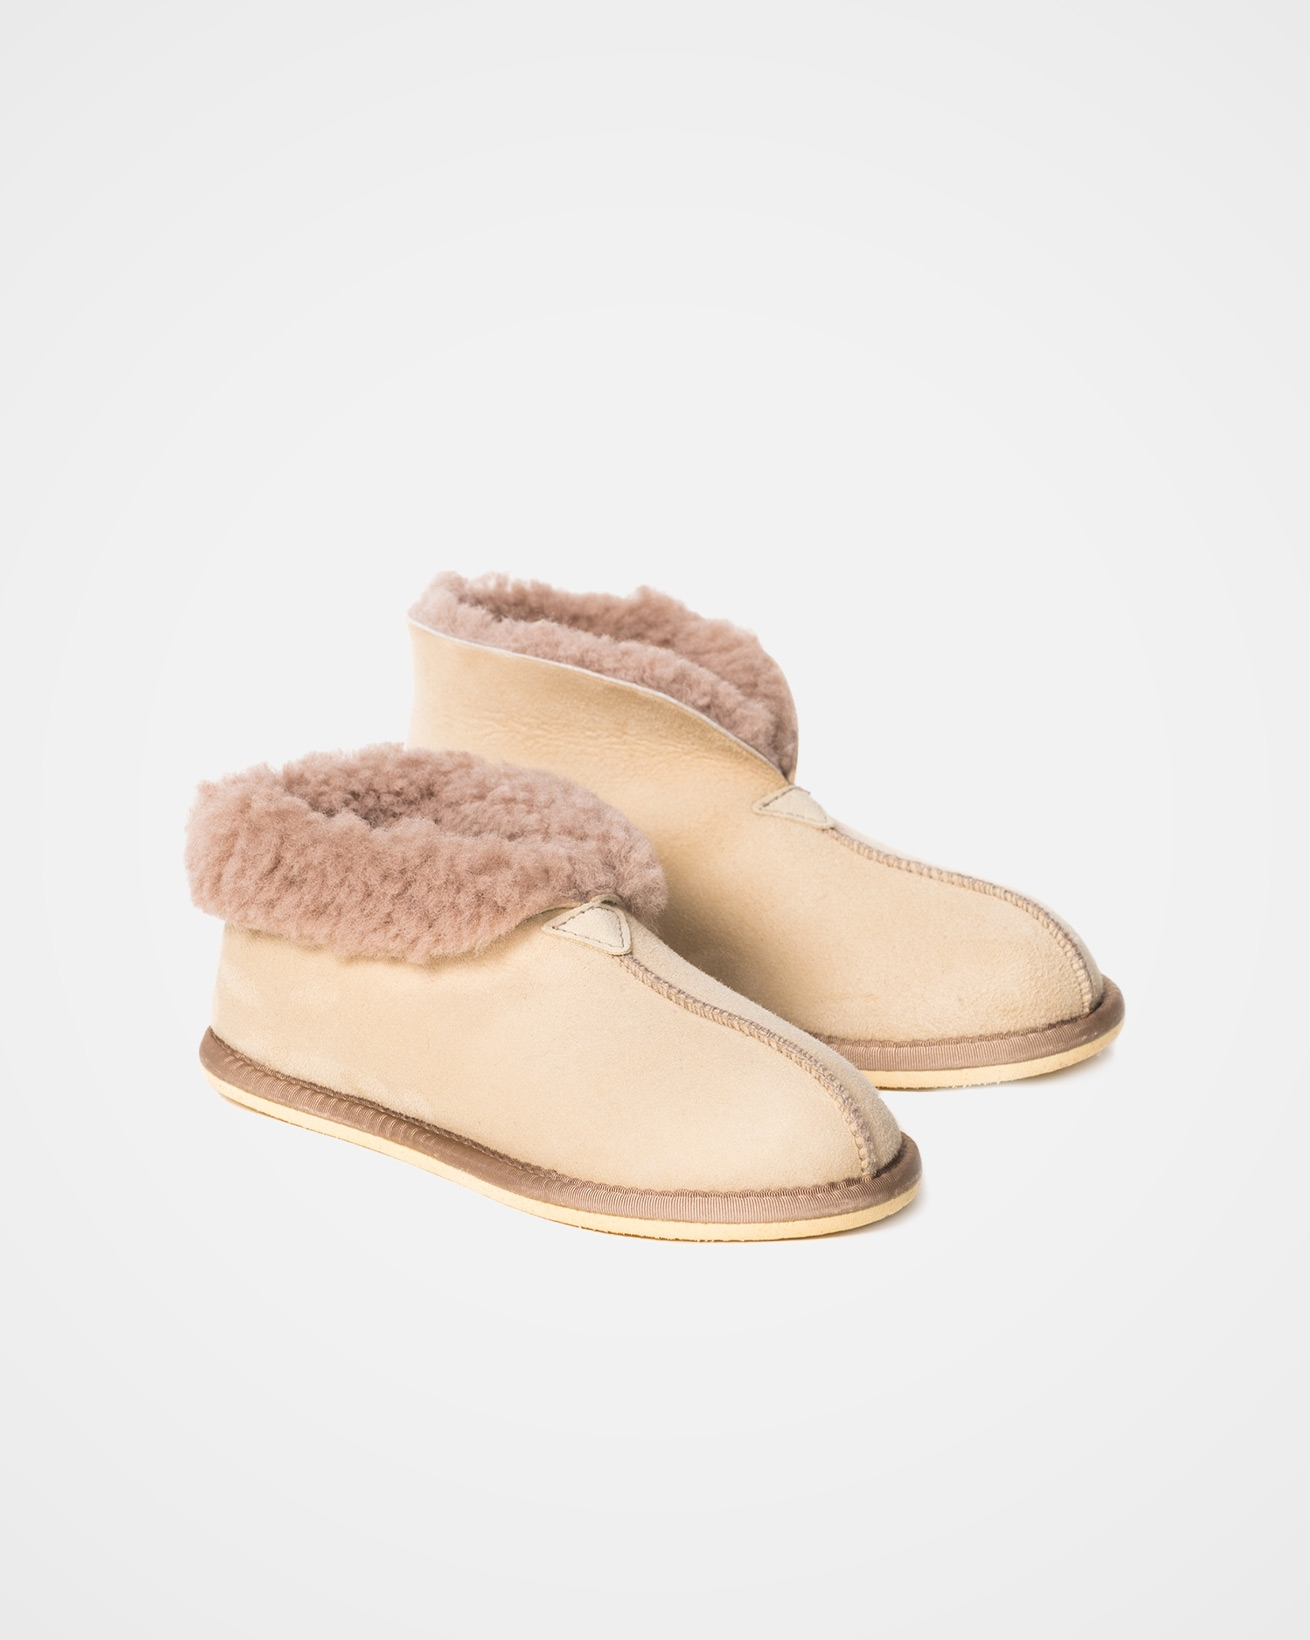 Ladies Sheepskin Bootee Slipper - Size 3 - Oatmeal - 2071